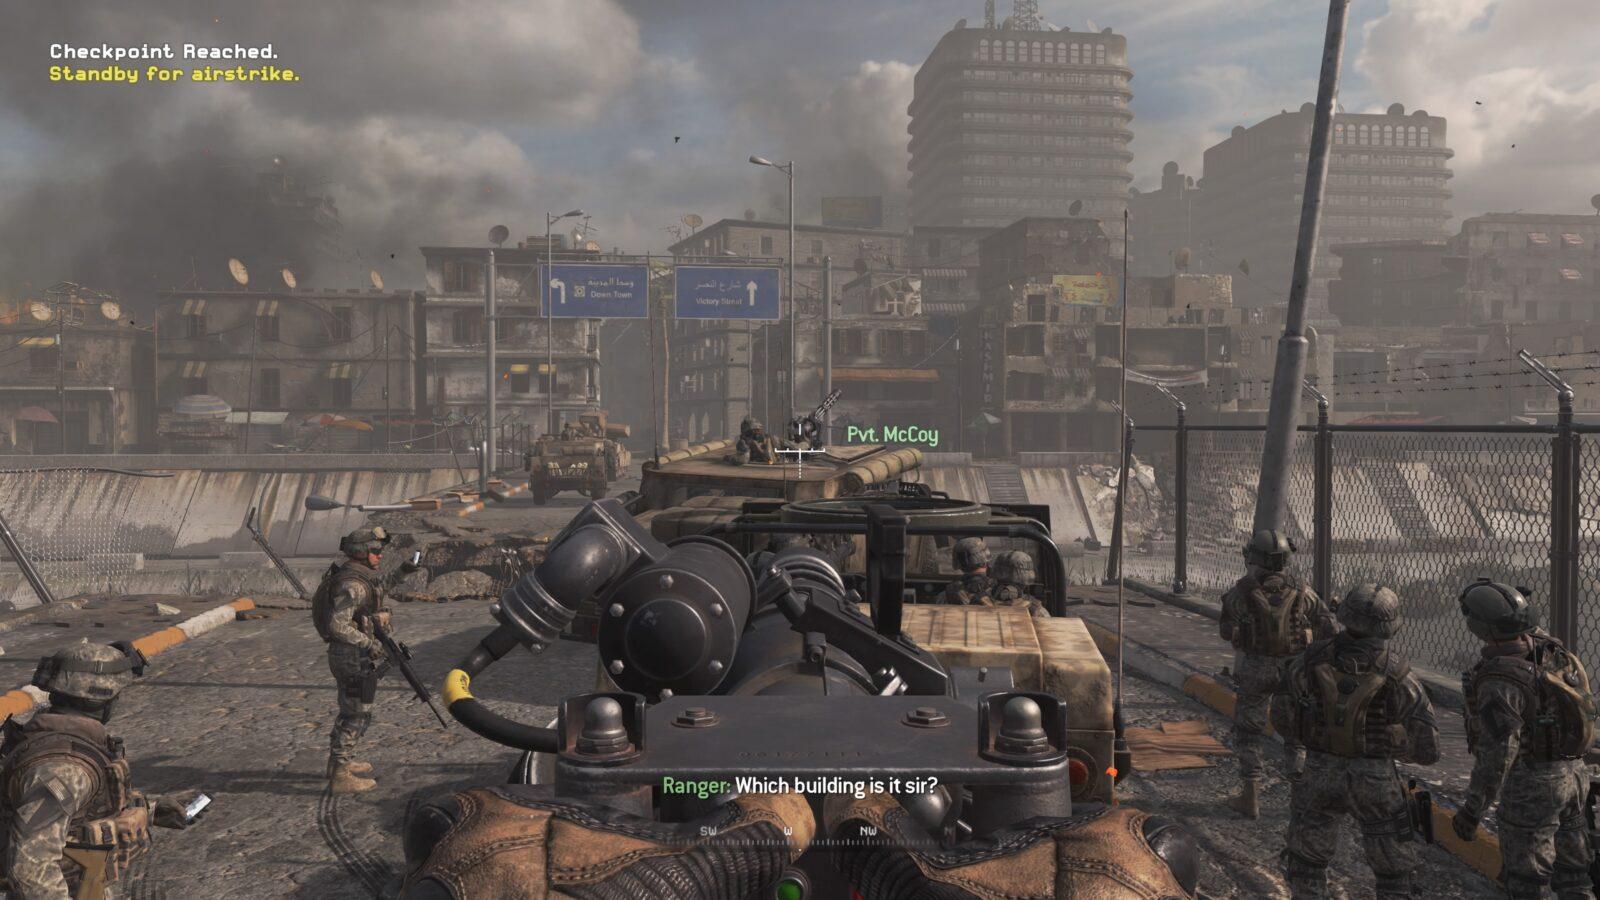 3rd Strike Com Call Of Duty Modern Warfare 2 Campaign